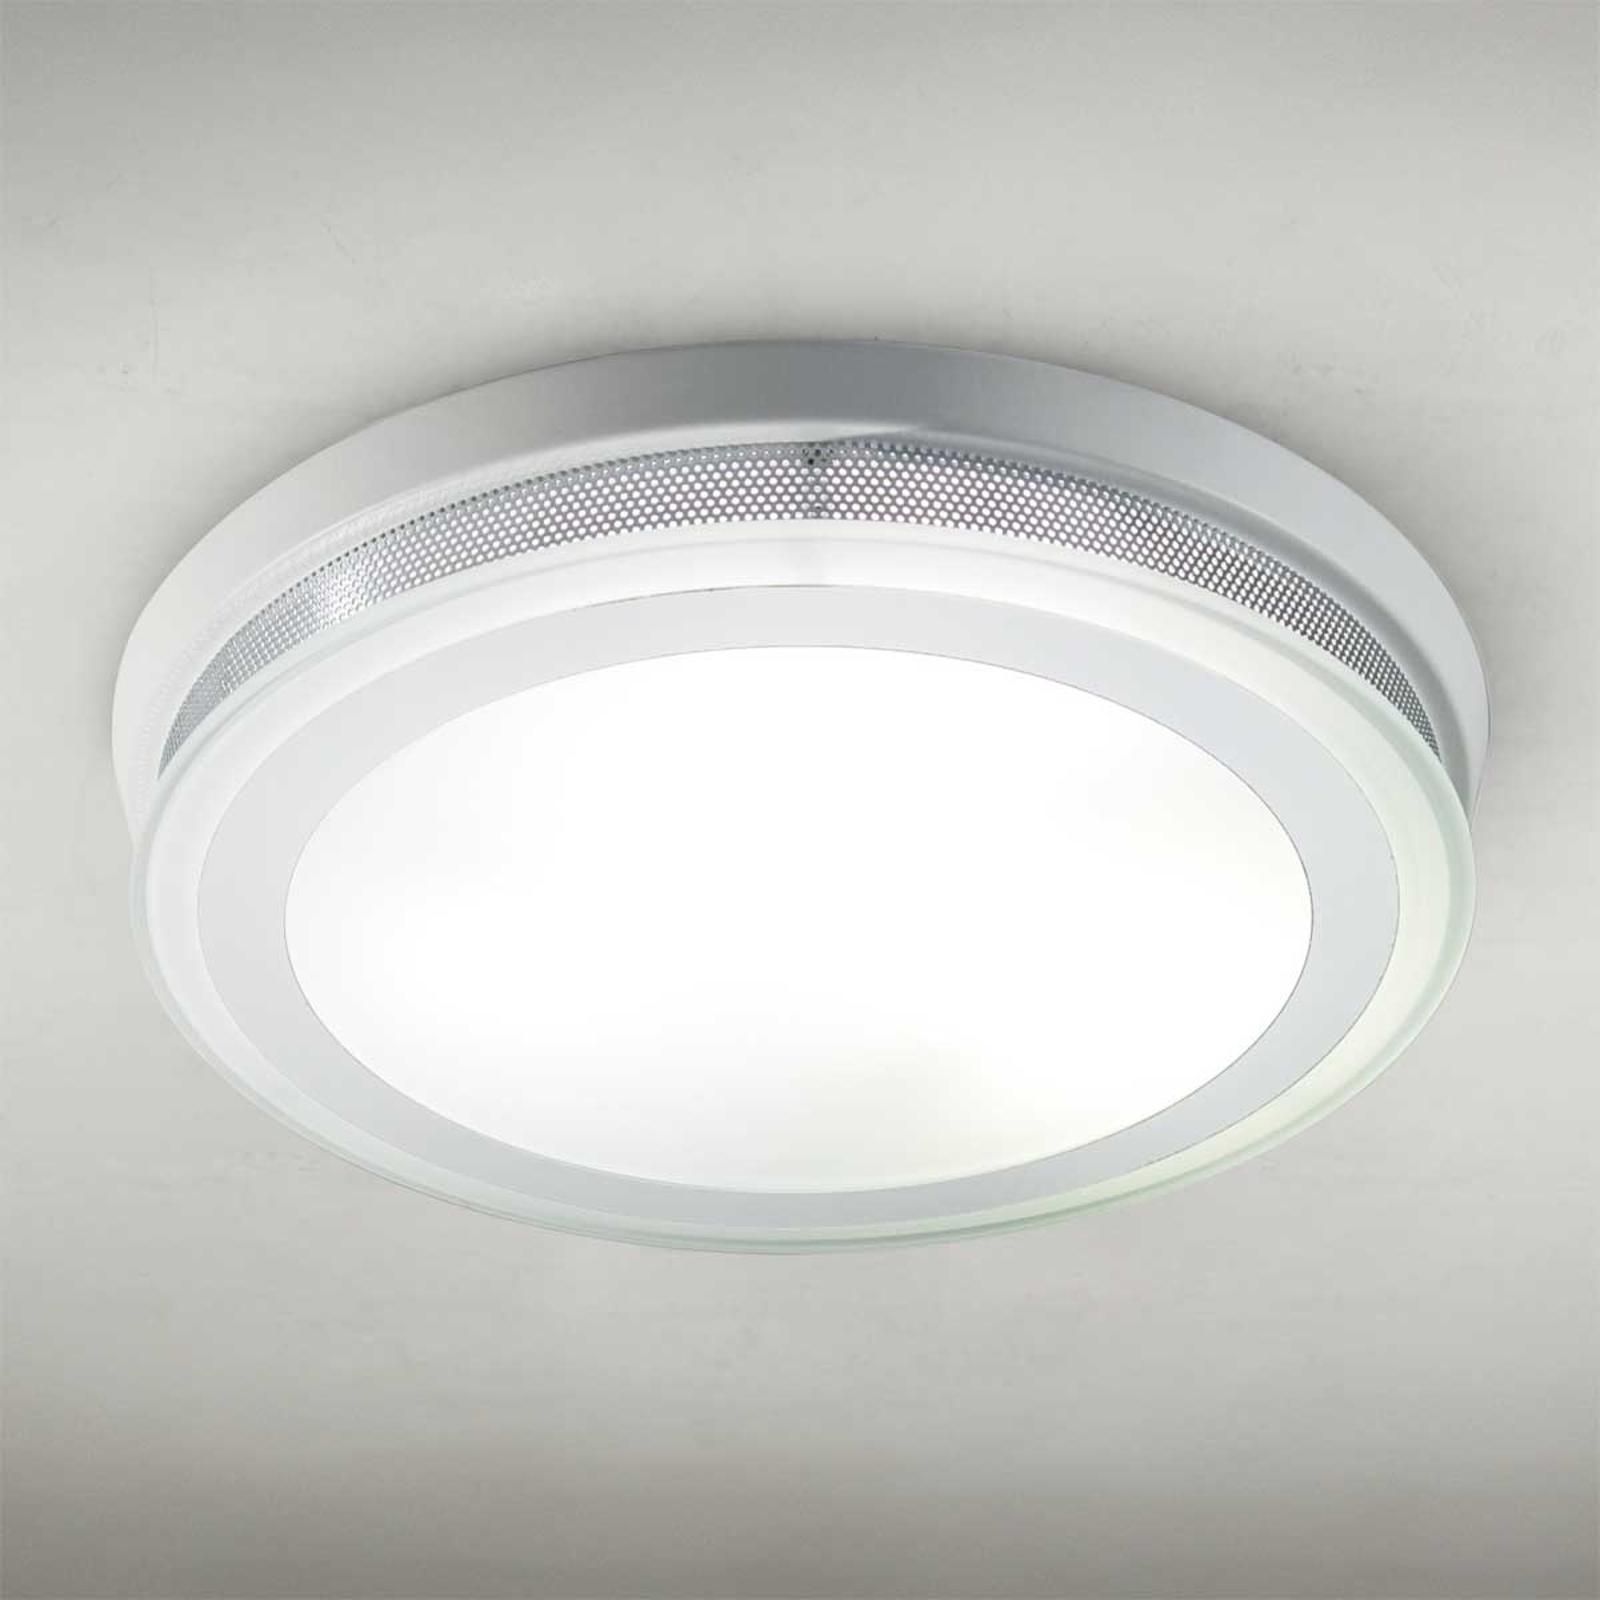 Rund taklampe RING 9115, hvit, 37cm